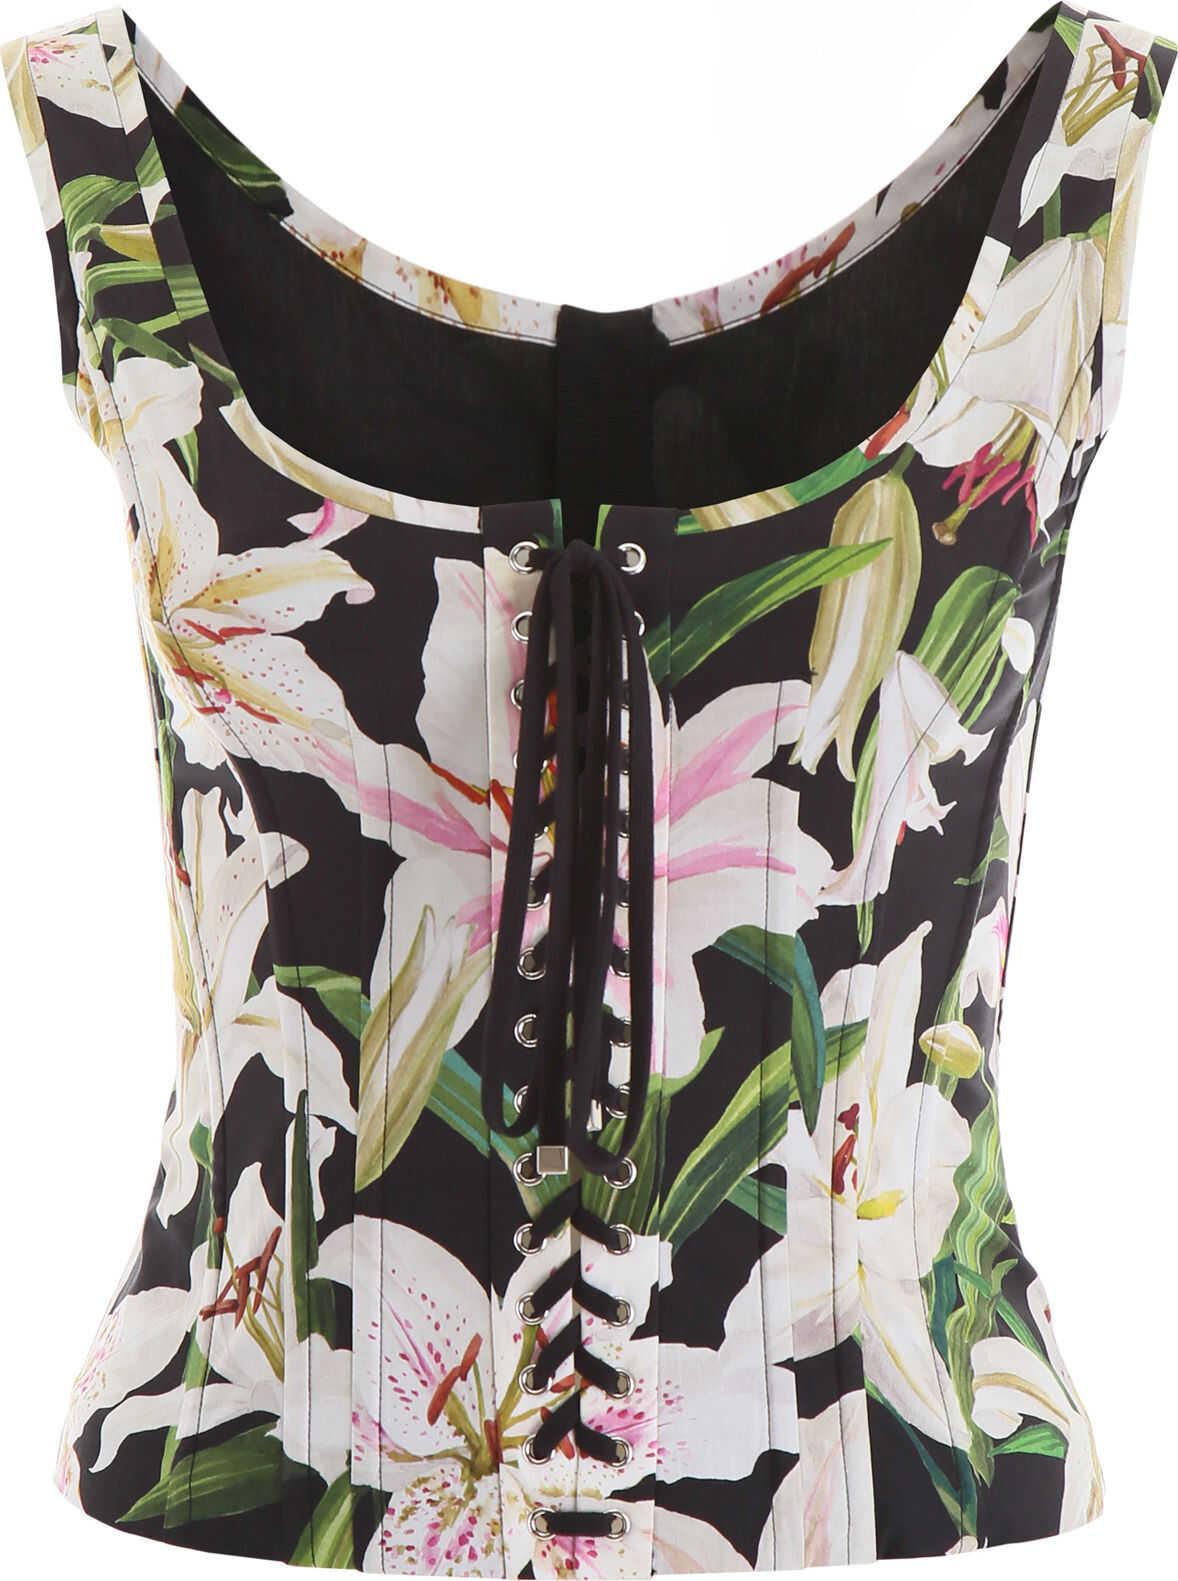 Dolce & Gabbana Lily Print Bustier Top GIGLI FDO NERO